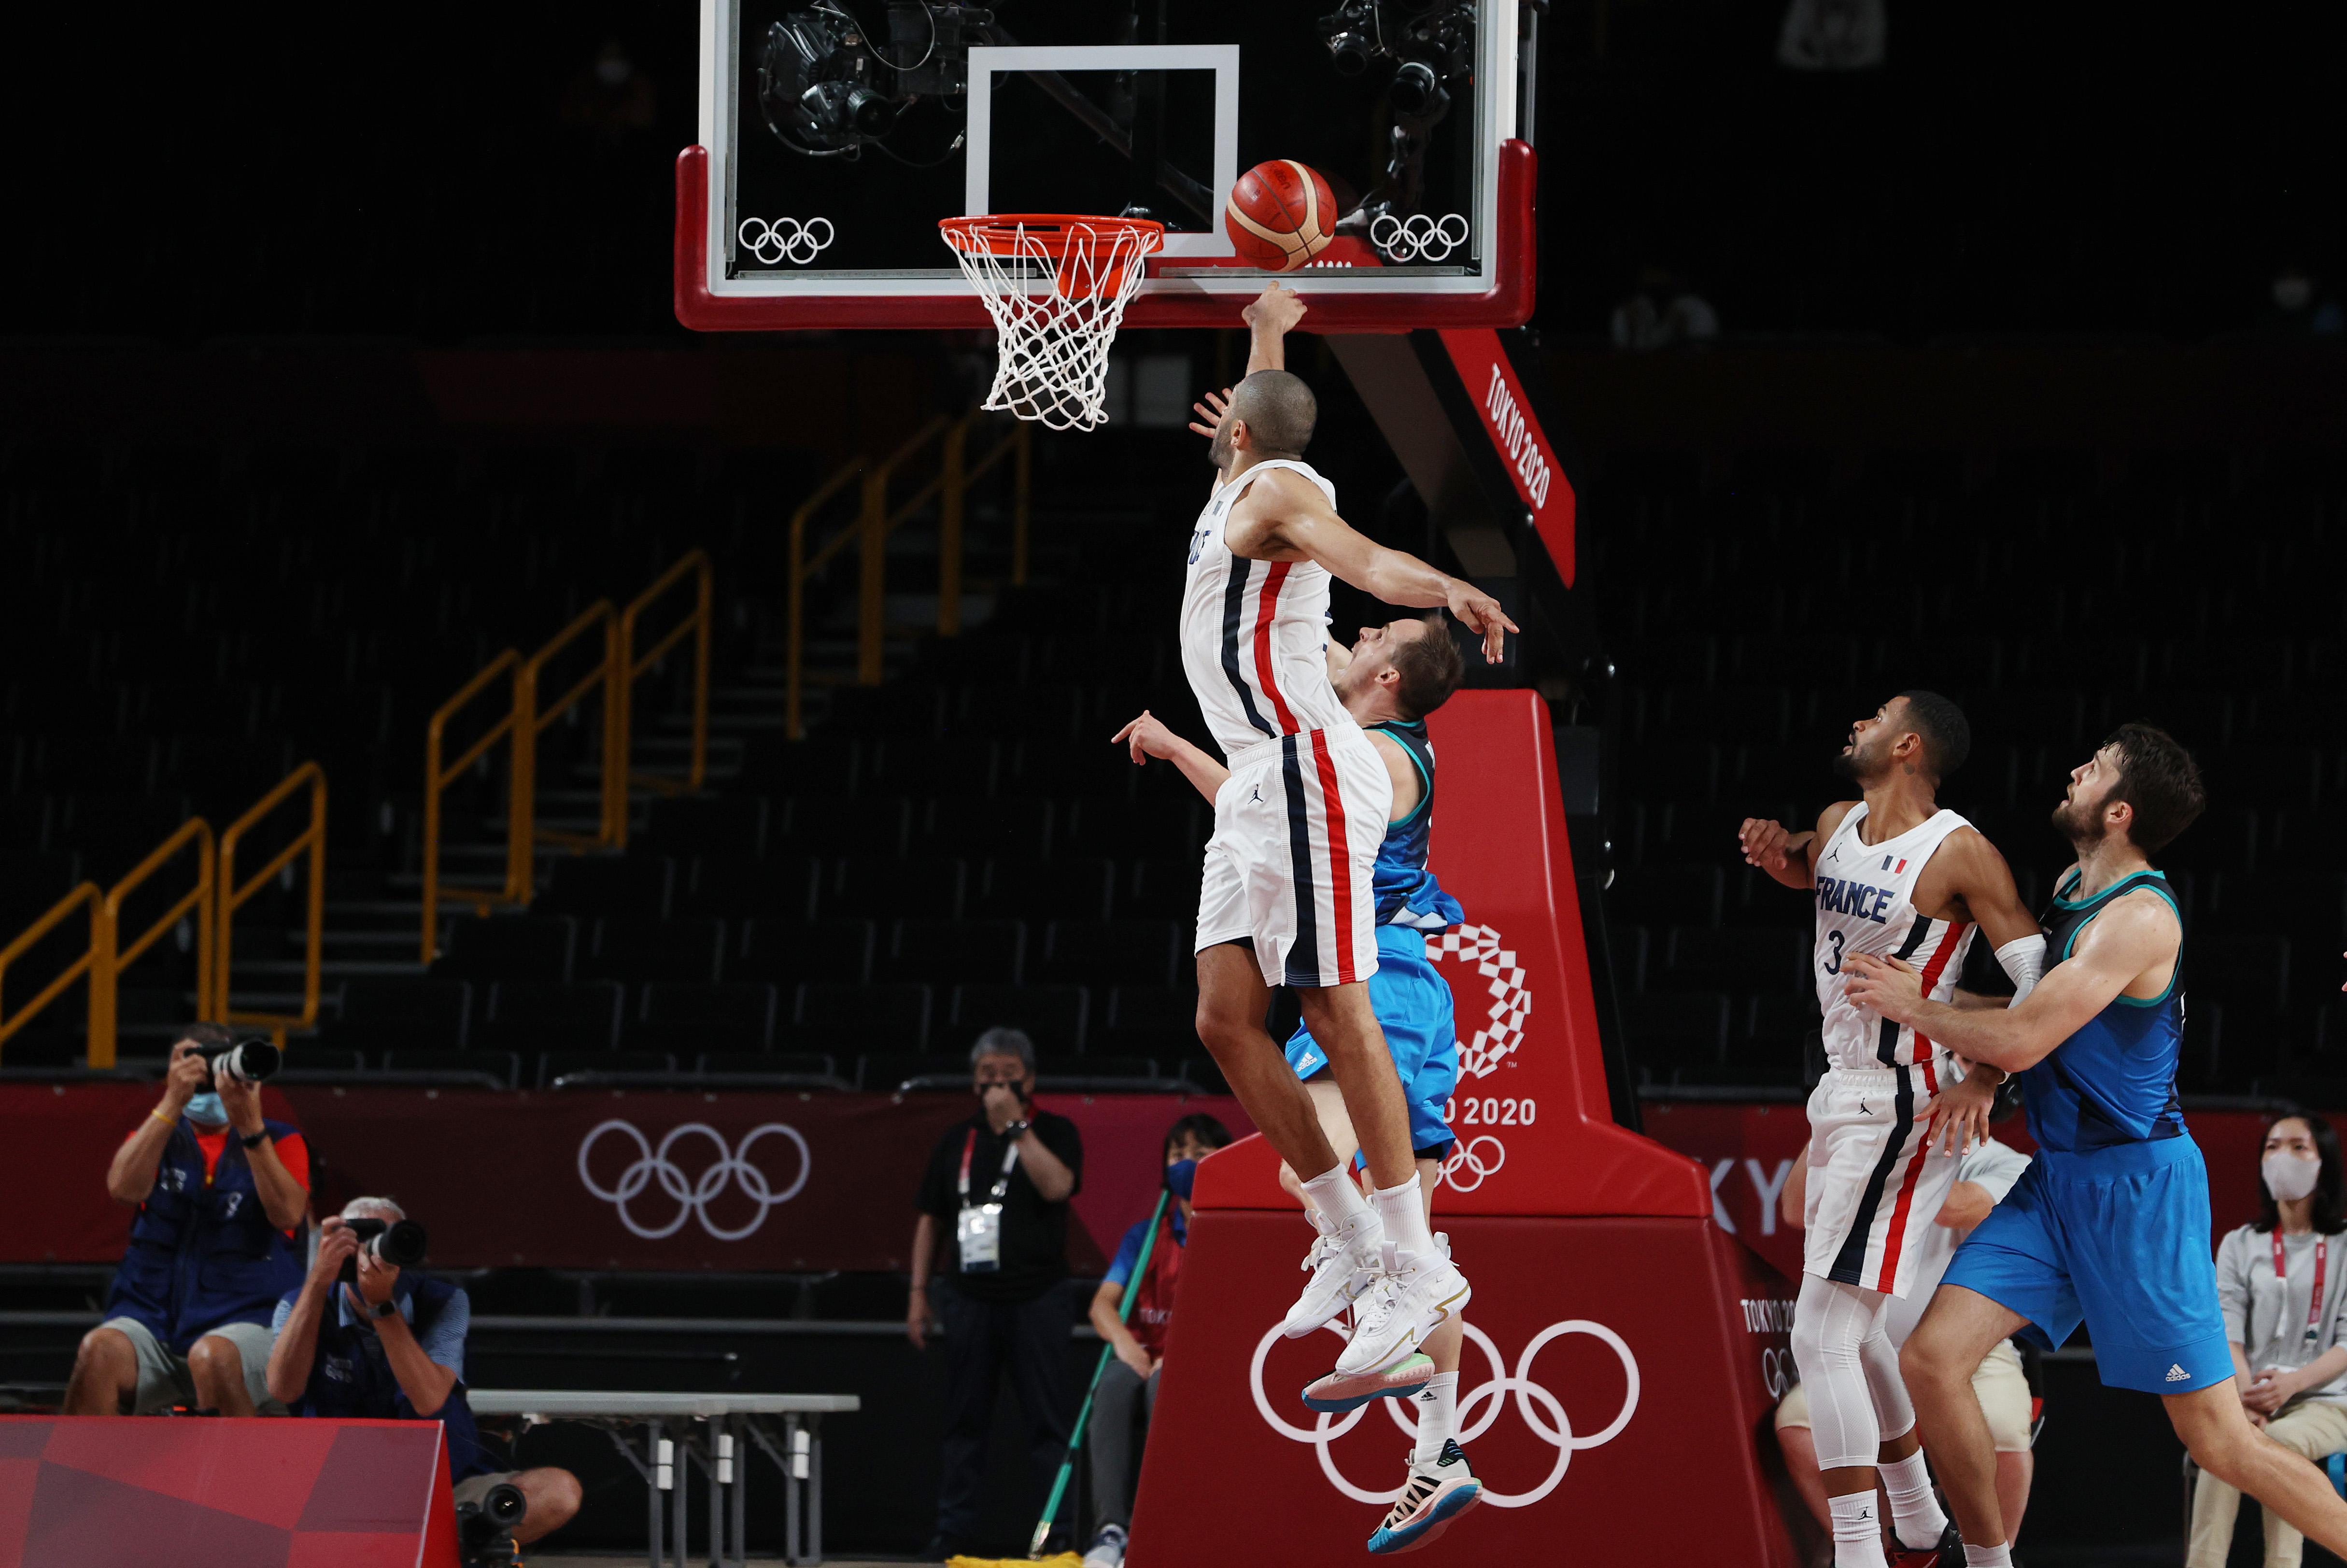 France v Slovenia Men's Basketball - Olympics: Day 13